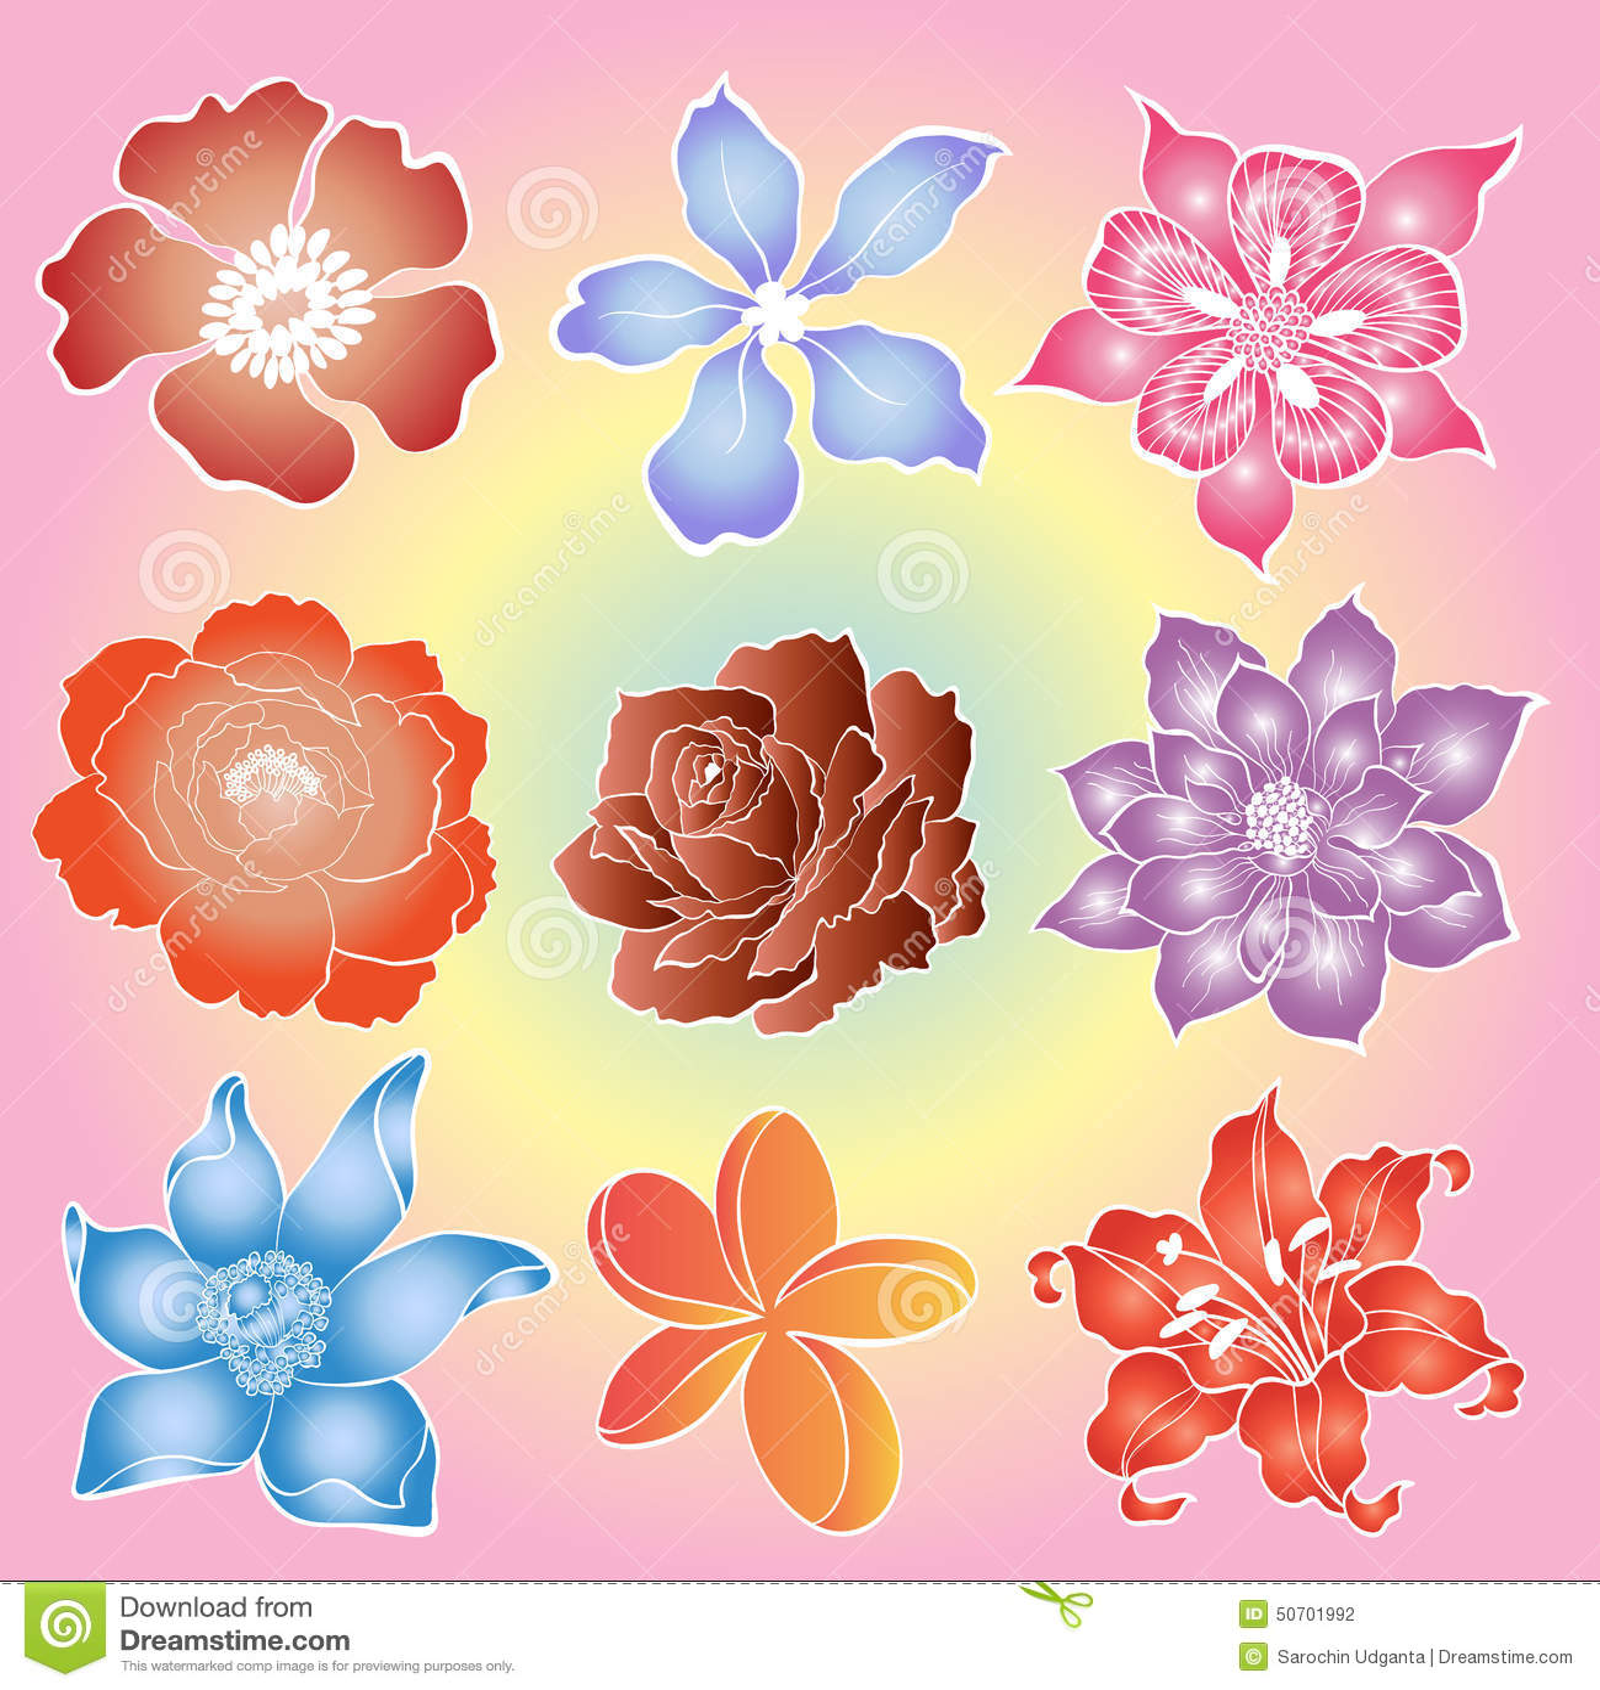 Batik design royalty free stock photos image 29546988 - Batik Flowers Stock Photography